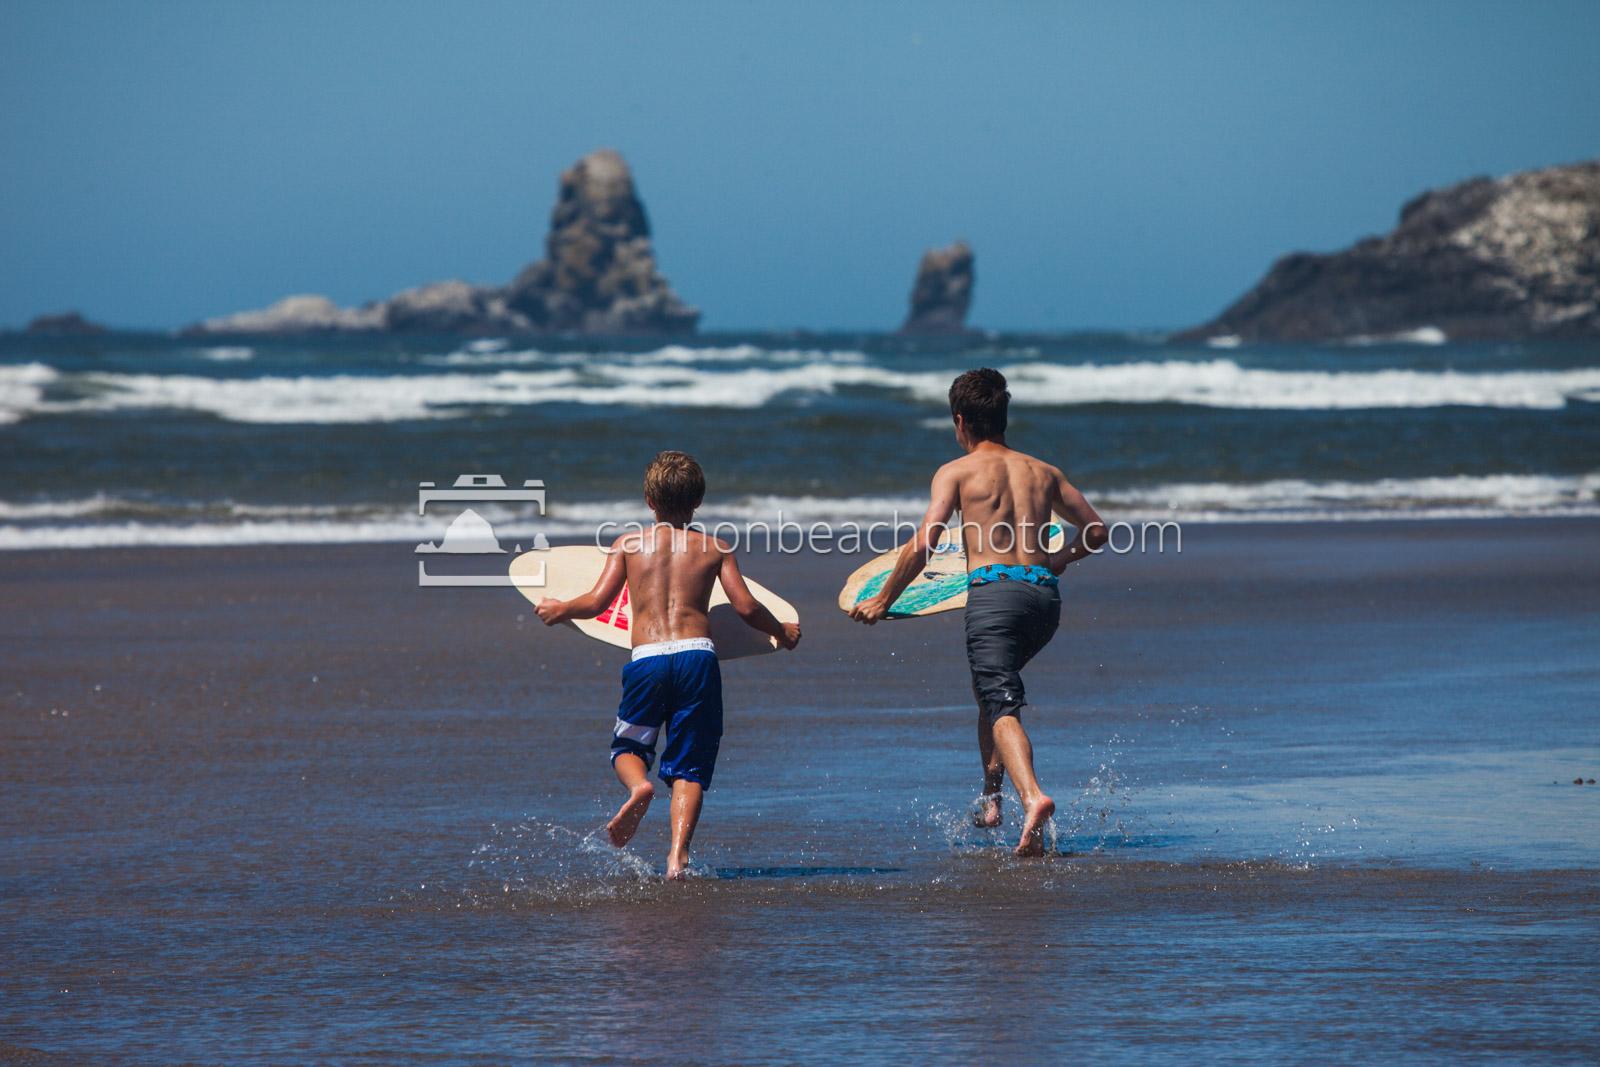 Boys Skimboarding in Cannon Beach 1